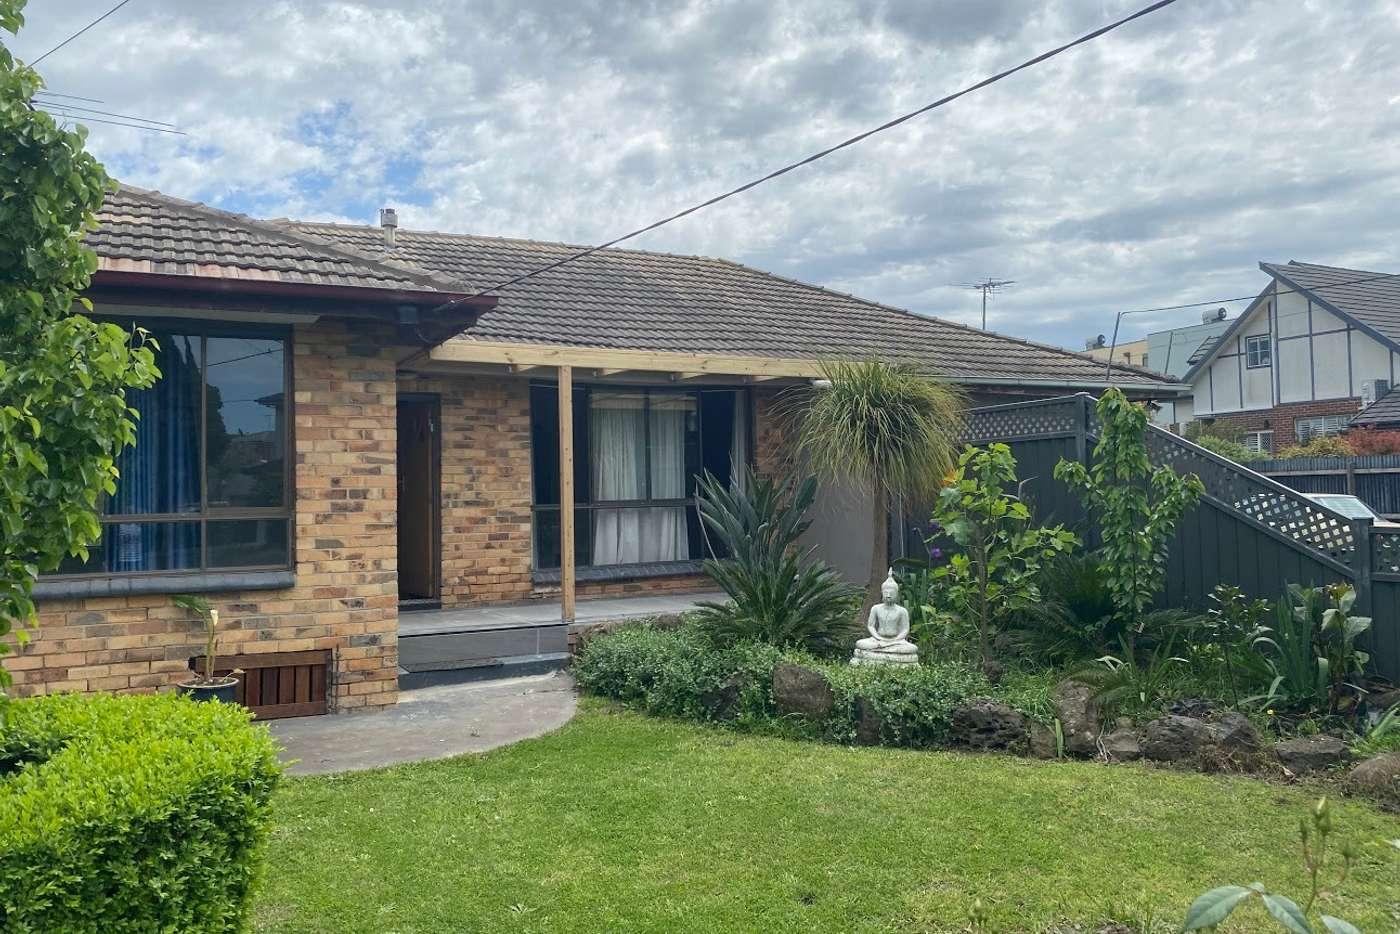 Main view of Homely house listing, 2/18B Bridges Avenue, Coburg VIC 3058